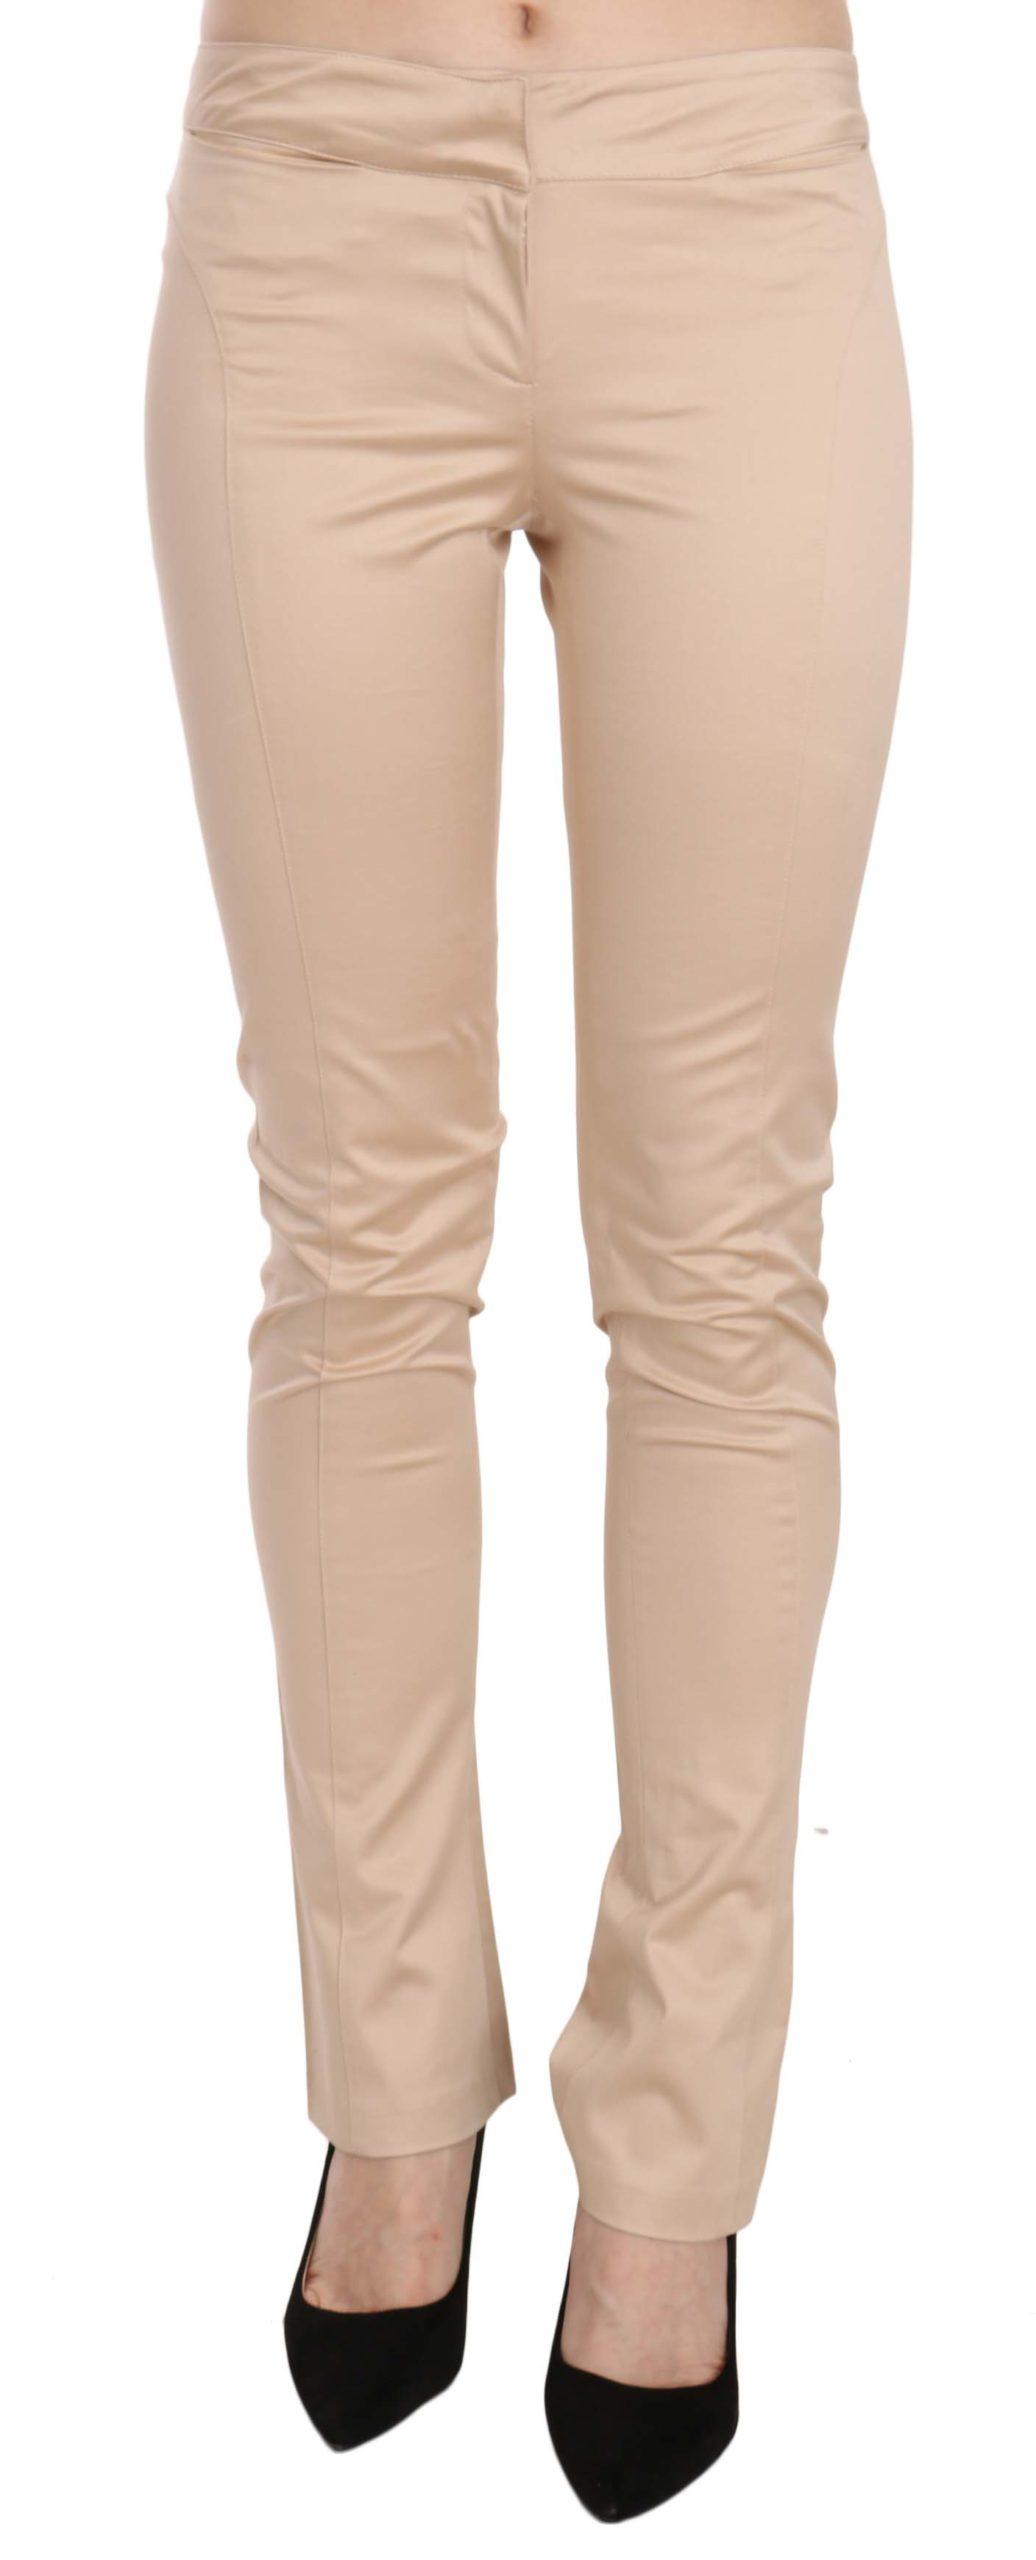 Just Cavalli Women's Low Waist Skinny Trouser Cream PAN70328 - IT38 XS